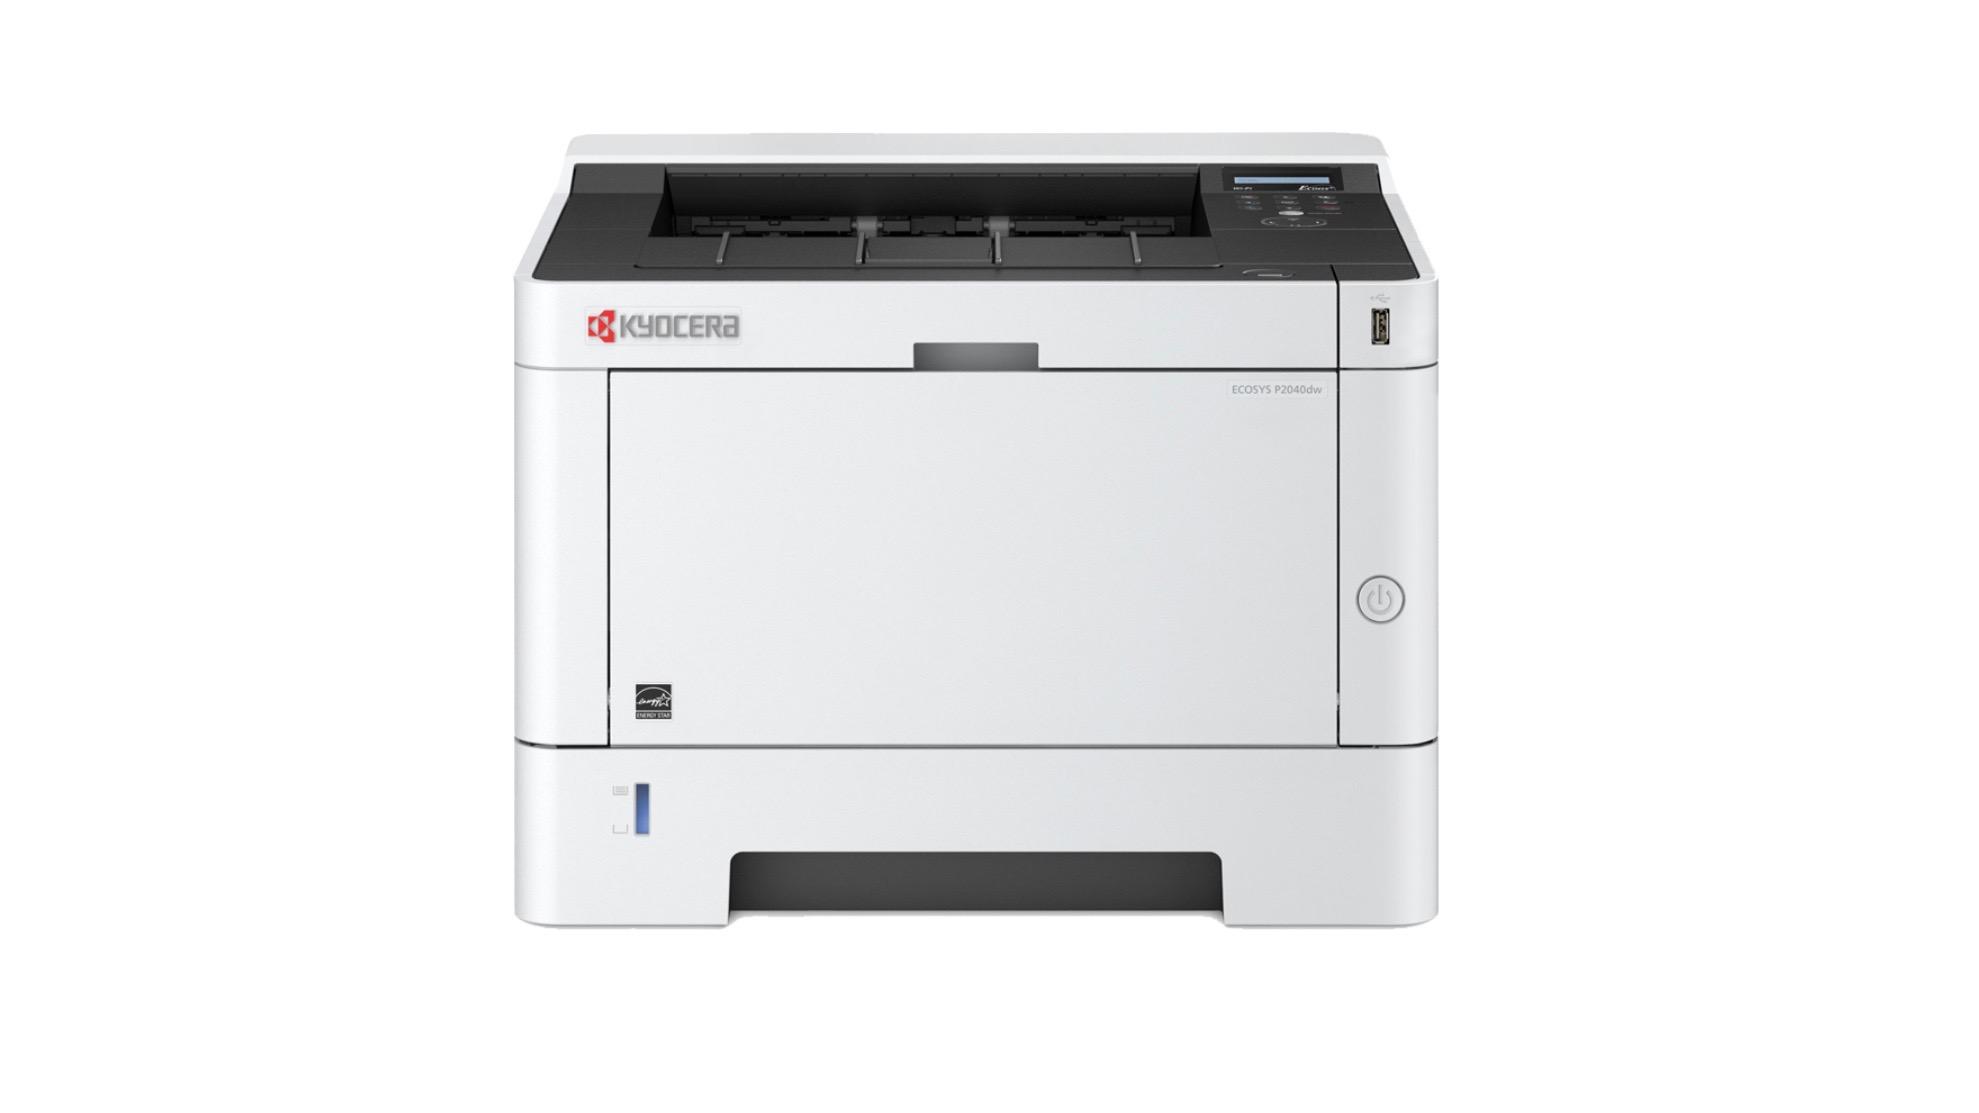 Kyocera Ecosys P5026cdw printer